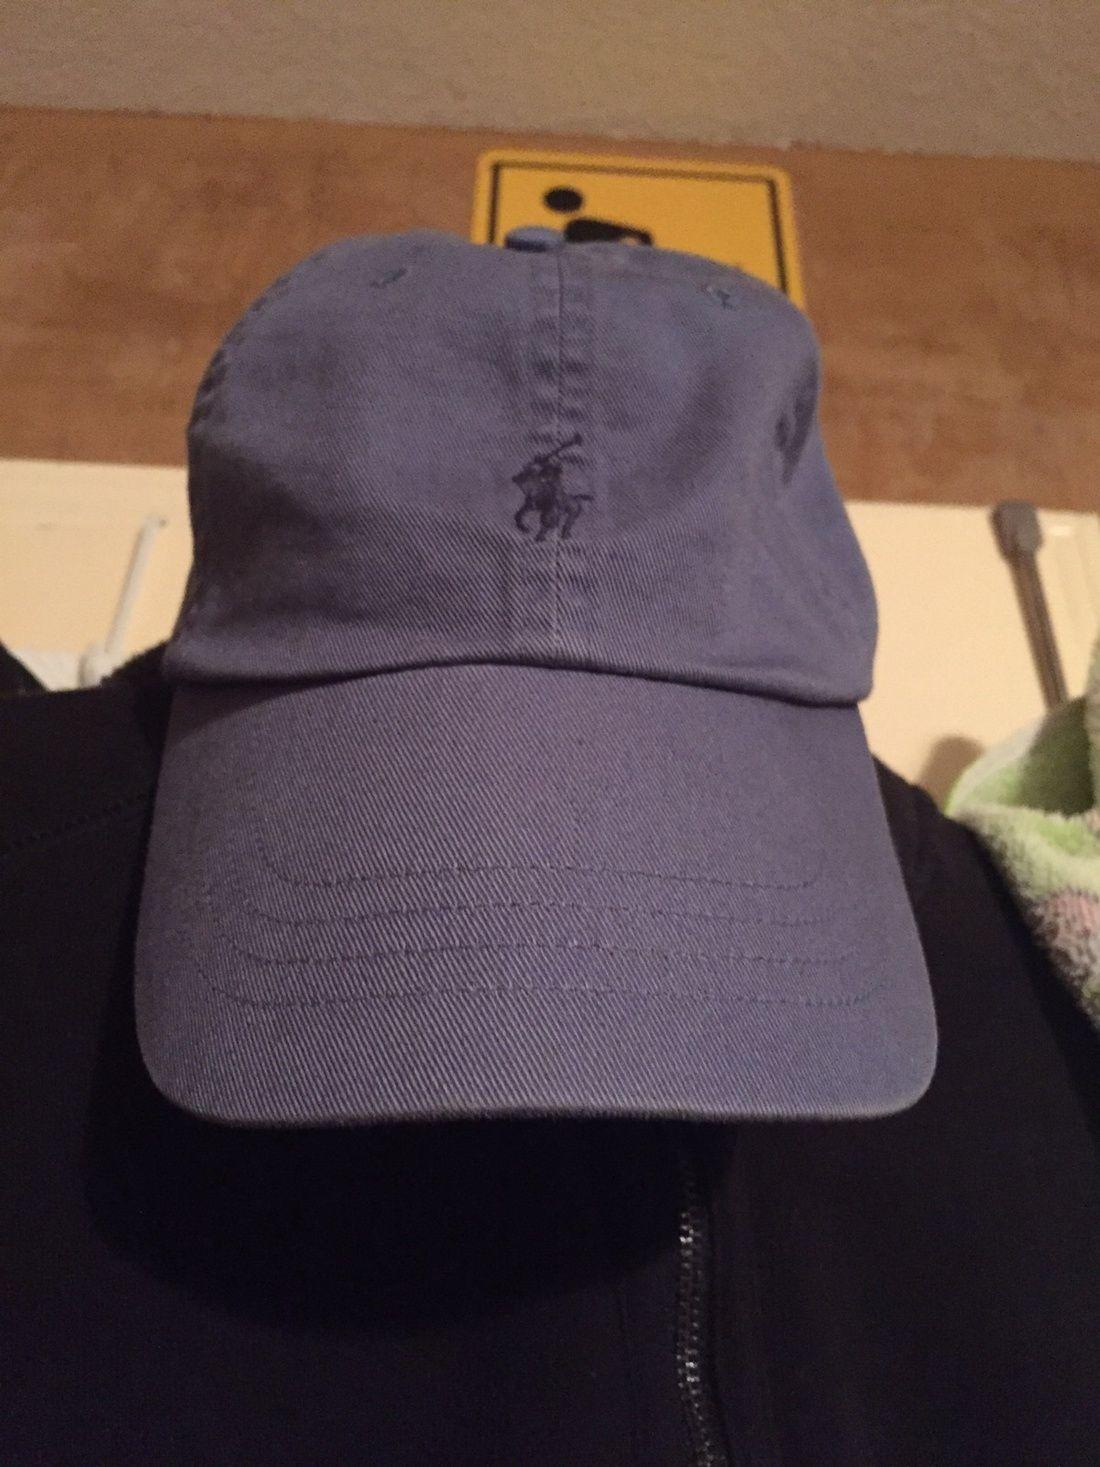 40295549a3b Polo Ralph Lauren Polo Ralph Lauren Strap Back Hat Size One Size  22 -  Grailed